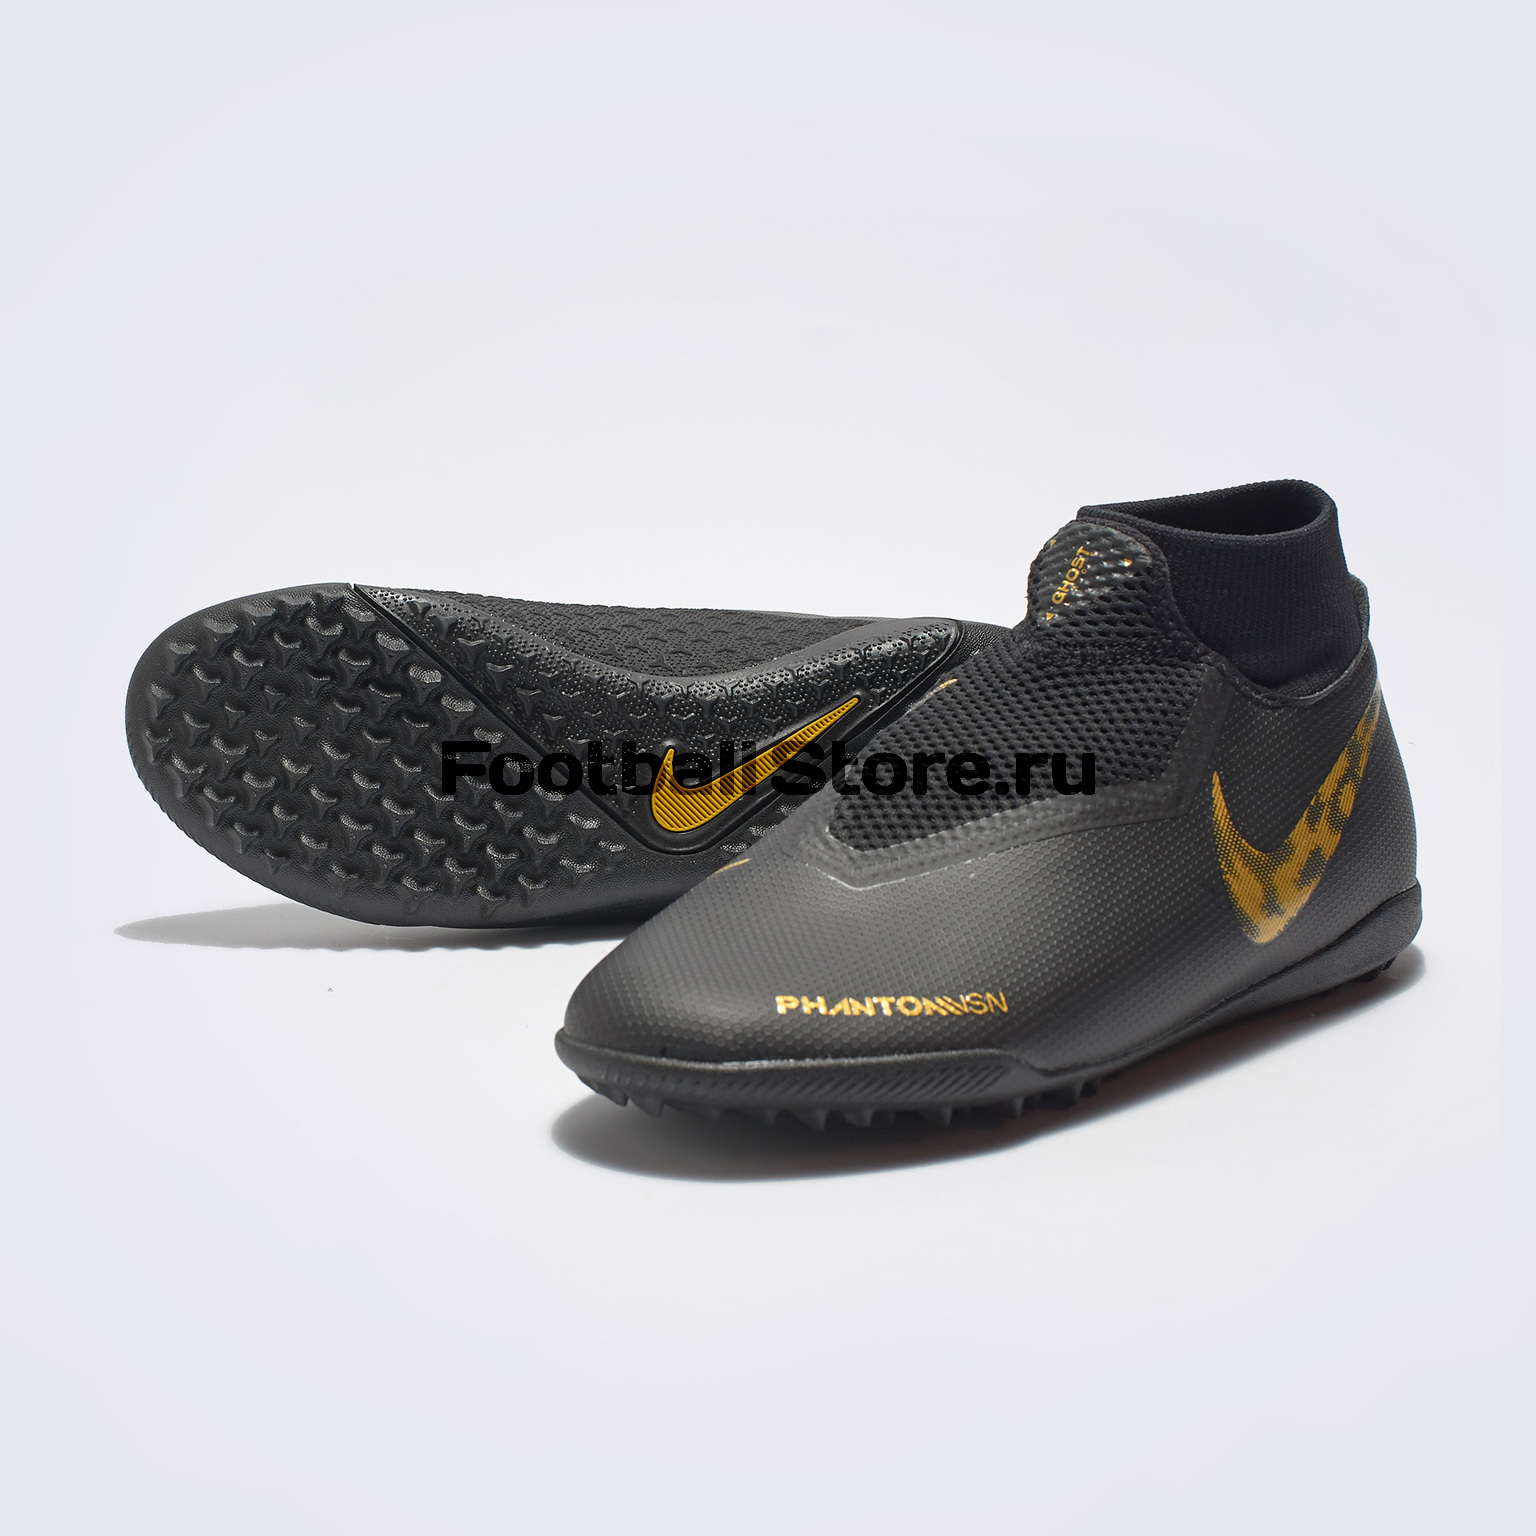 Шиповки Nike Phantom Vision Academy DF TF AO3269-077 бутсы детские nike phantom vision academy df sg aq9298 400